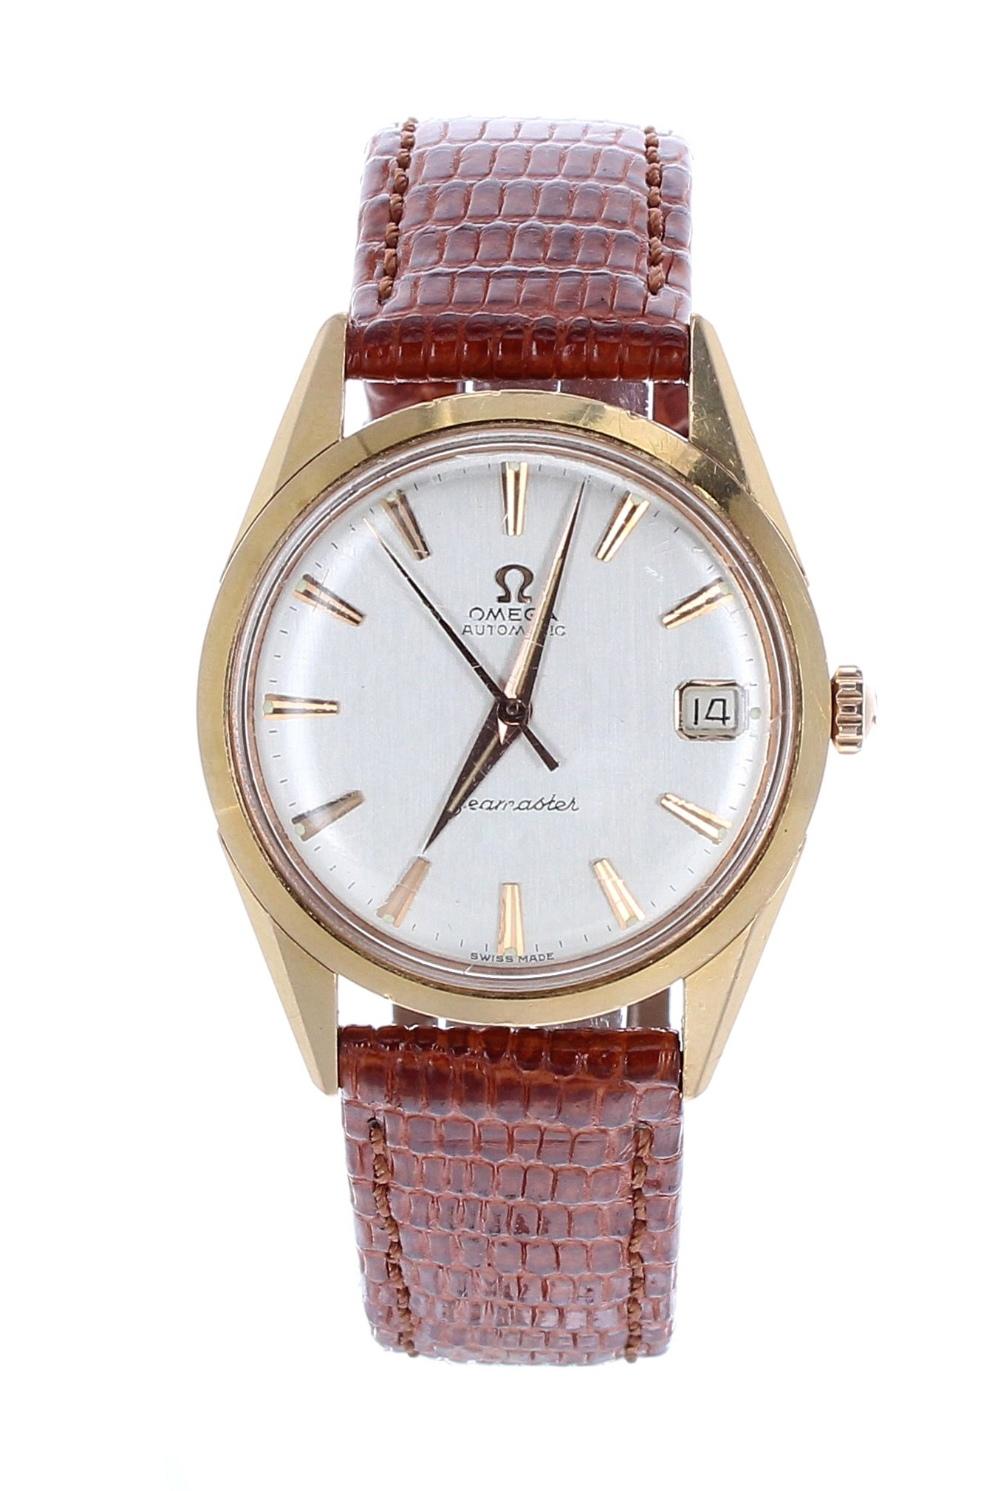 Lot 9 - Omega Seamaster automatic 18k gentleman's wristwatch, case ref. 579031, circa 1962, serial no.